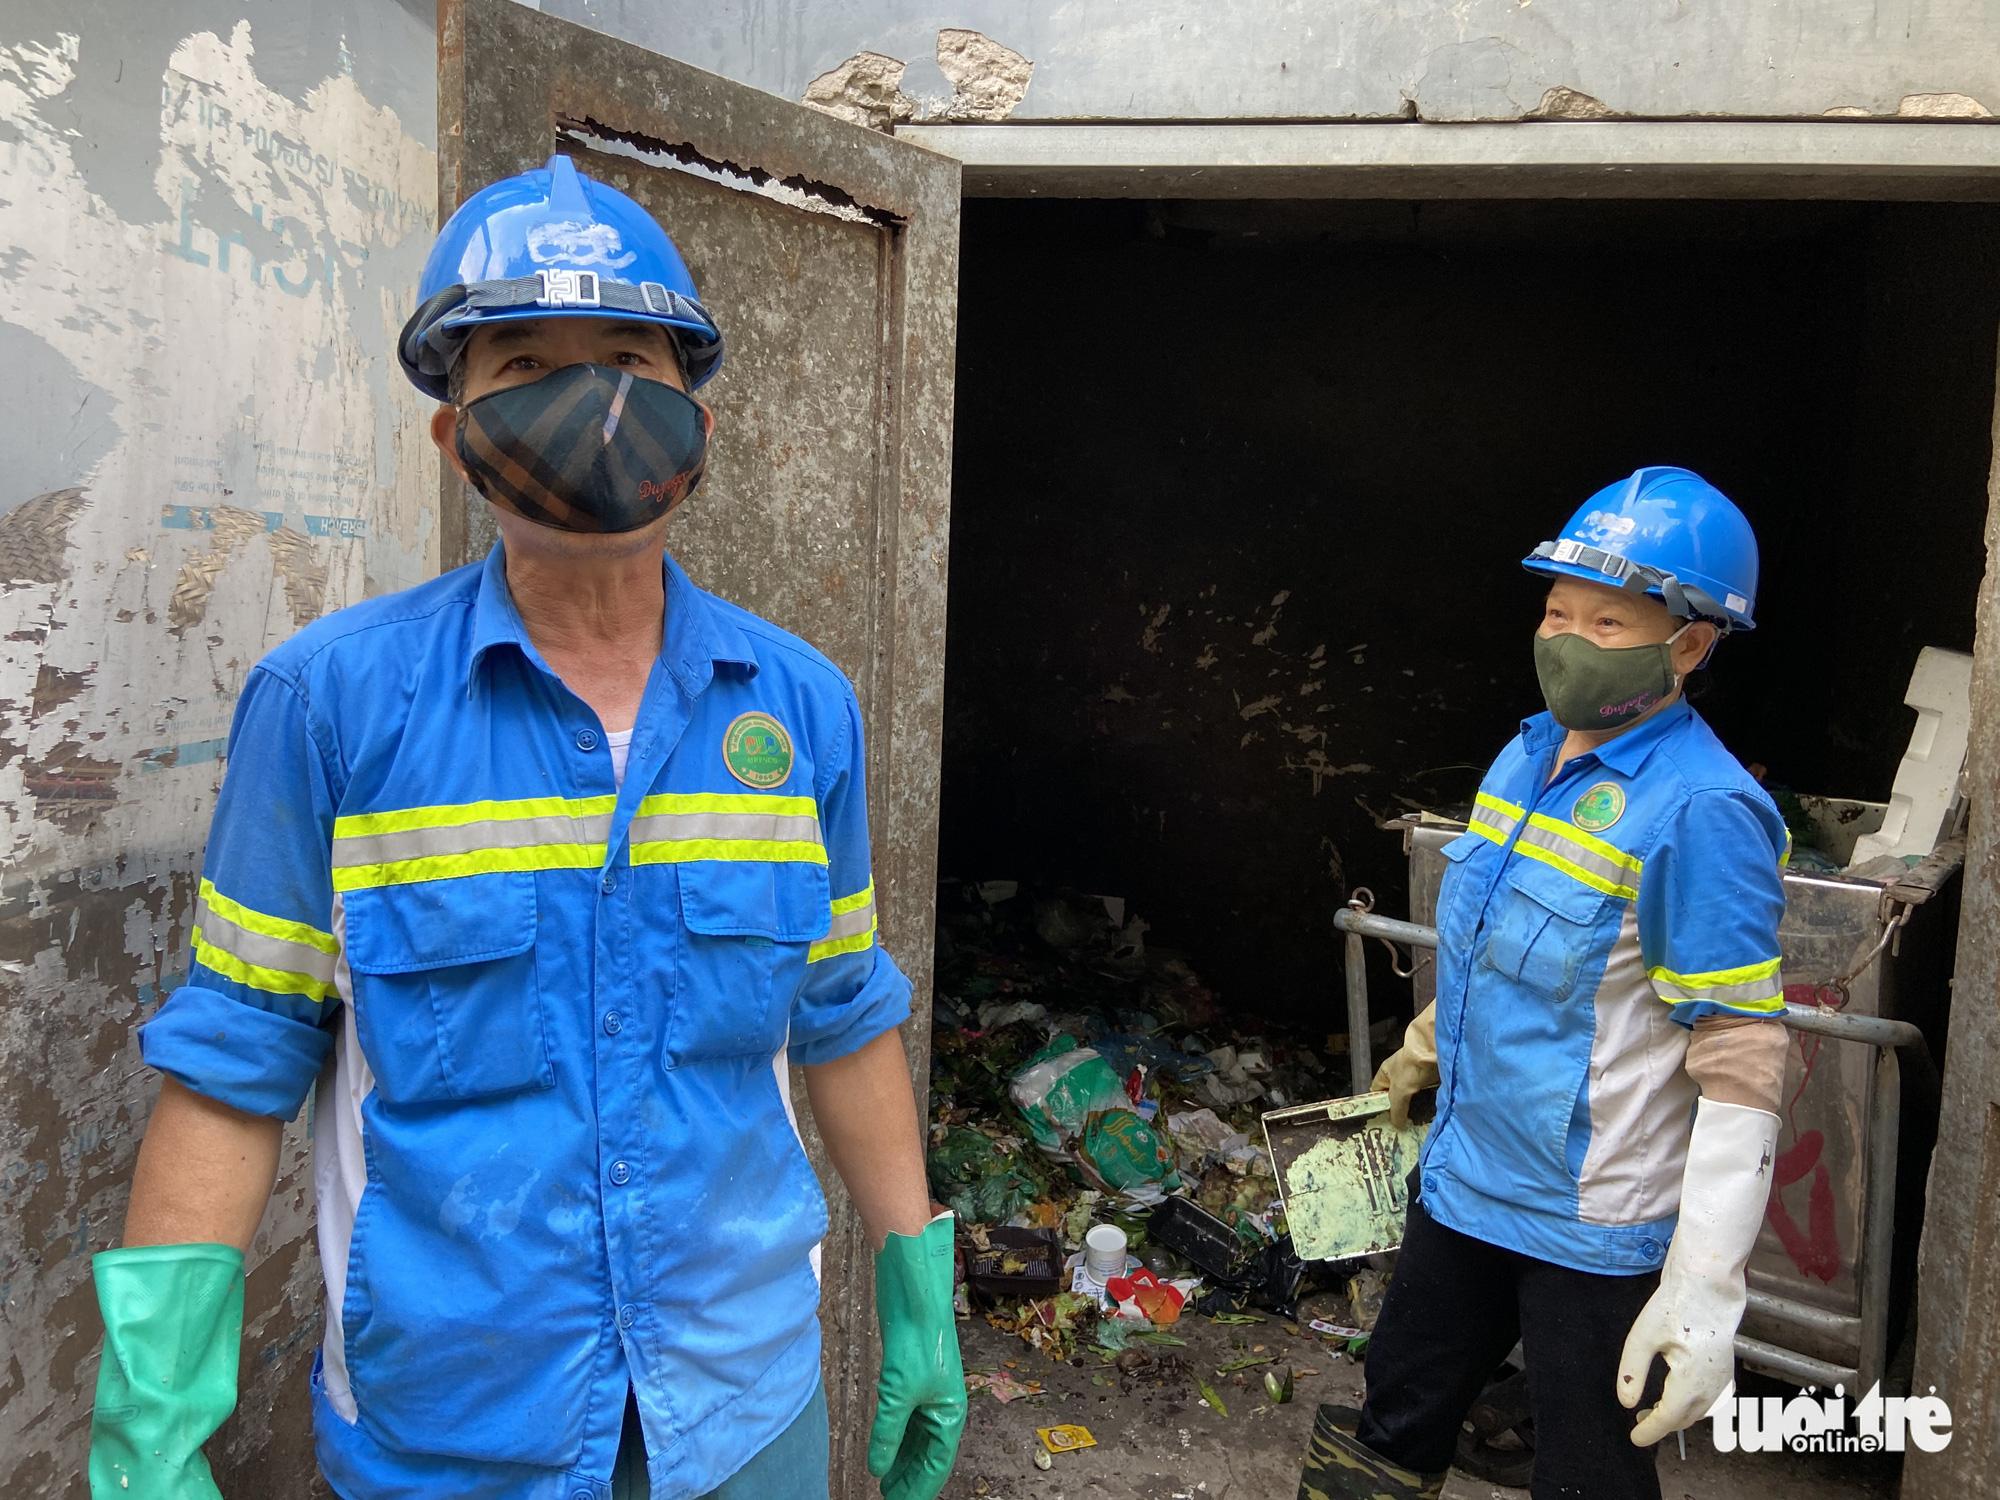 Trash collectors collect garbage in Nam Tu Liem District, Hanoi. Photo: Quang The / Tuoi Tre